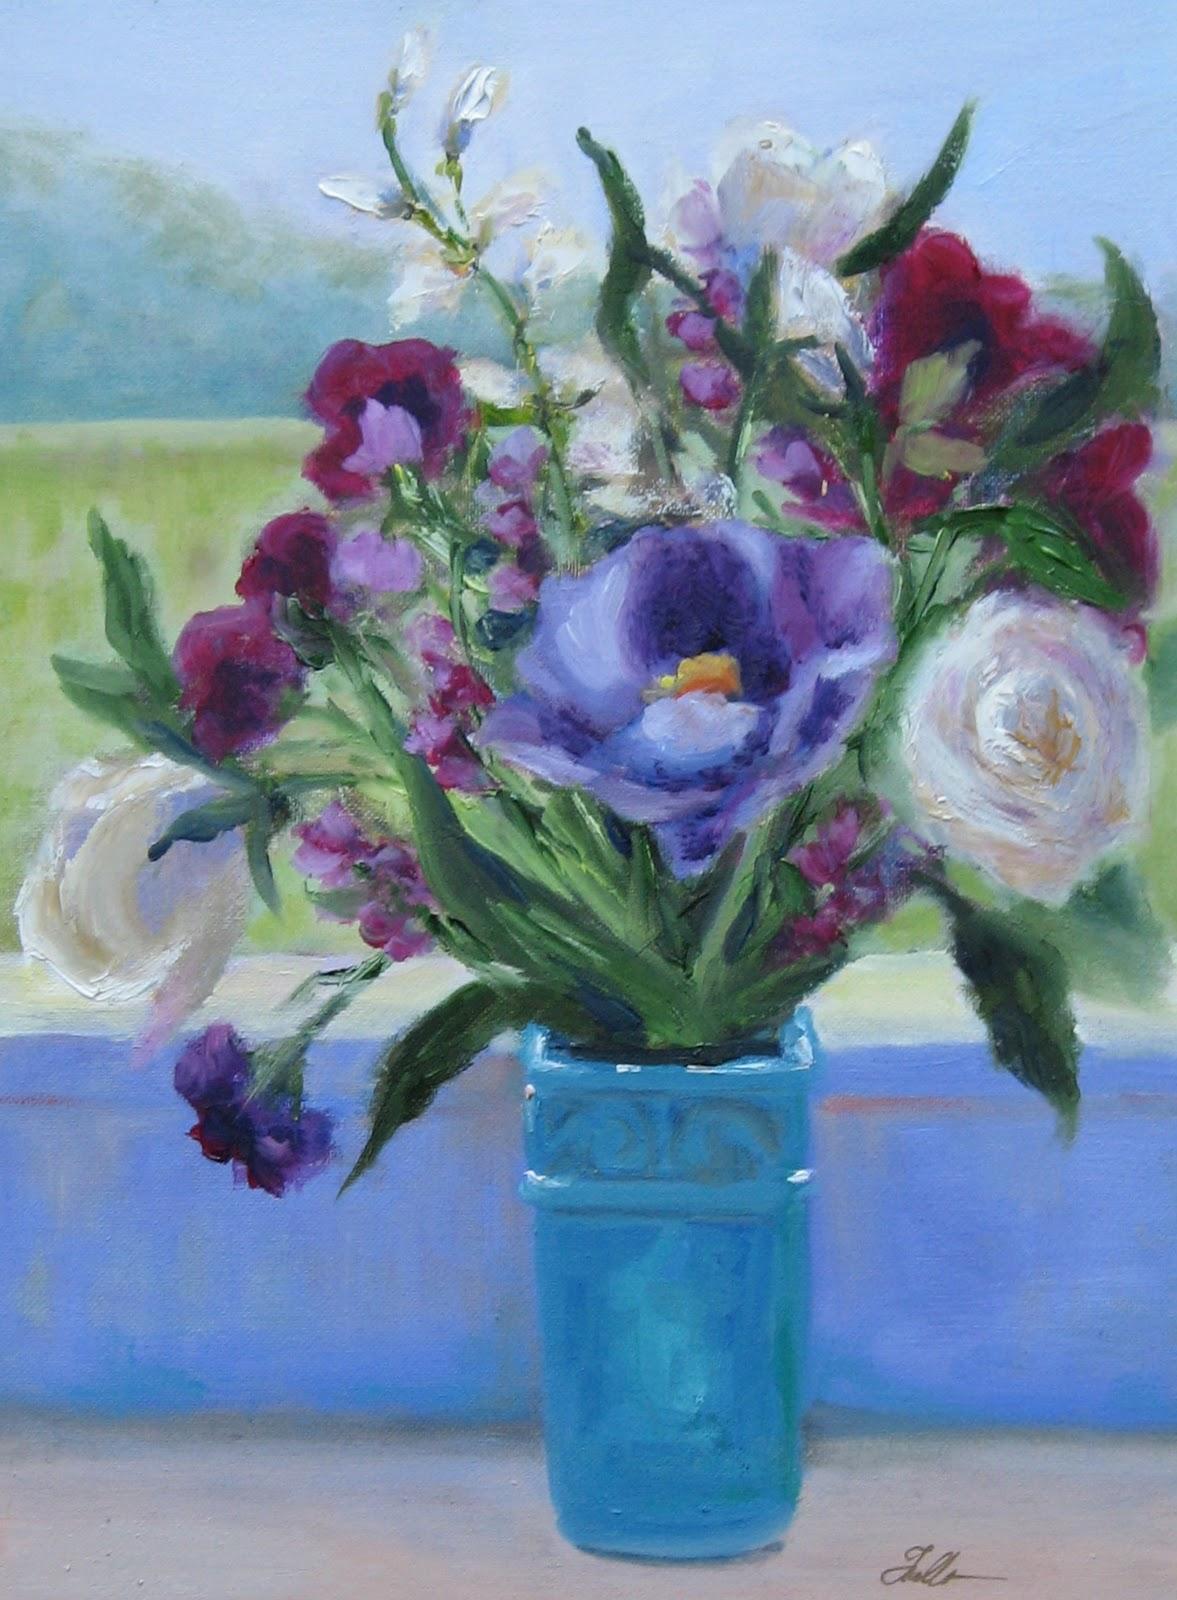 """Flower Study #47 - Giverny Morning"" original fine art by Pat Fiorello"